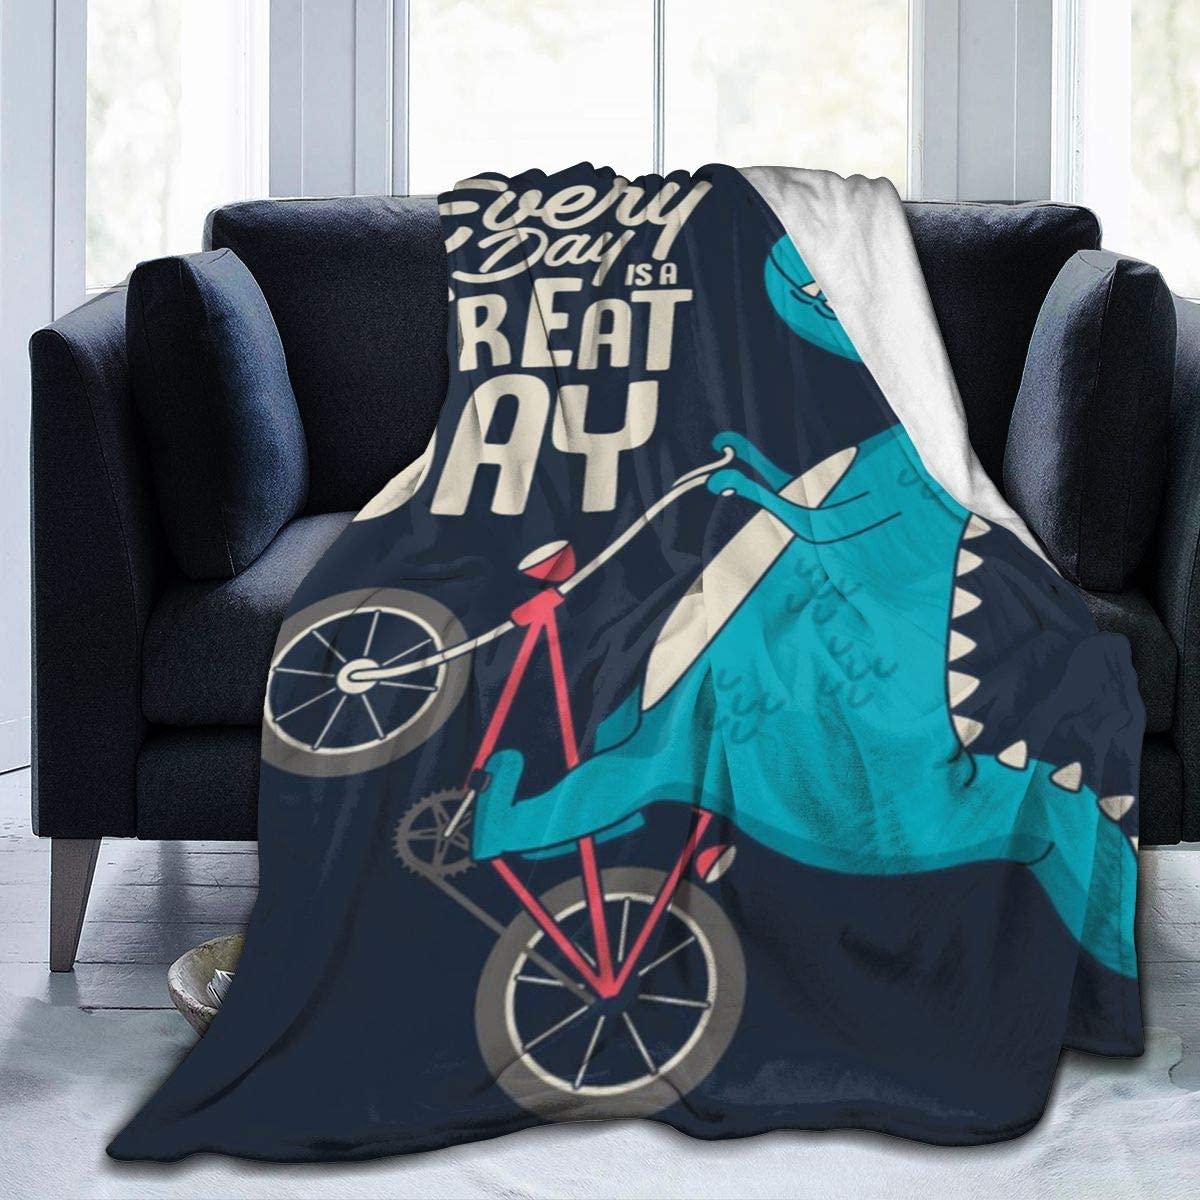 Micro Fleece Plush Soft Baby Blanket Cute Dinosaur Riding A Bike Fluffy Warm Toddler Bed/Crib Blanket Lightweight Flannel Daycare Nap Kids Sleeping Tummy Time Throw Blanket Girls Boy Kid/Baby